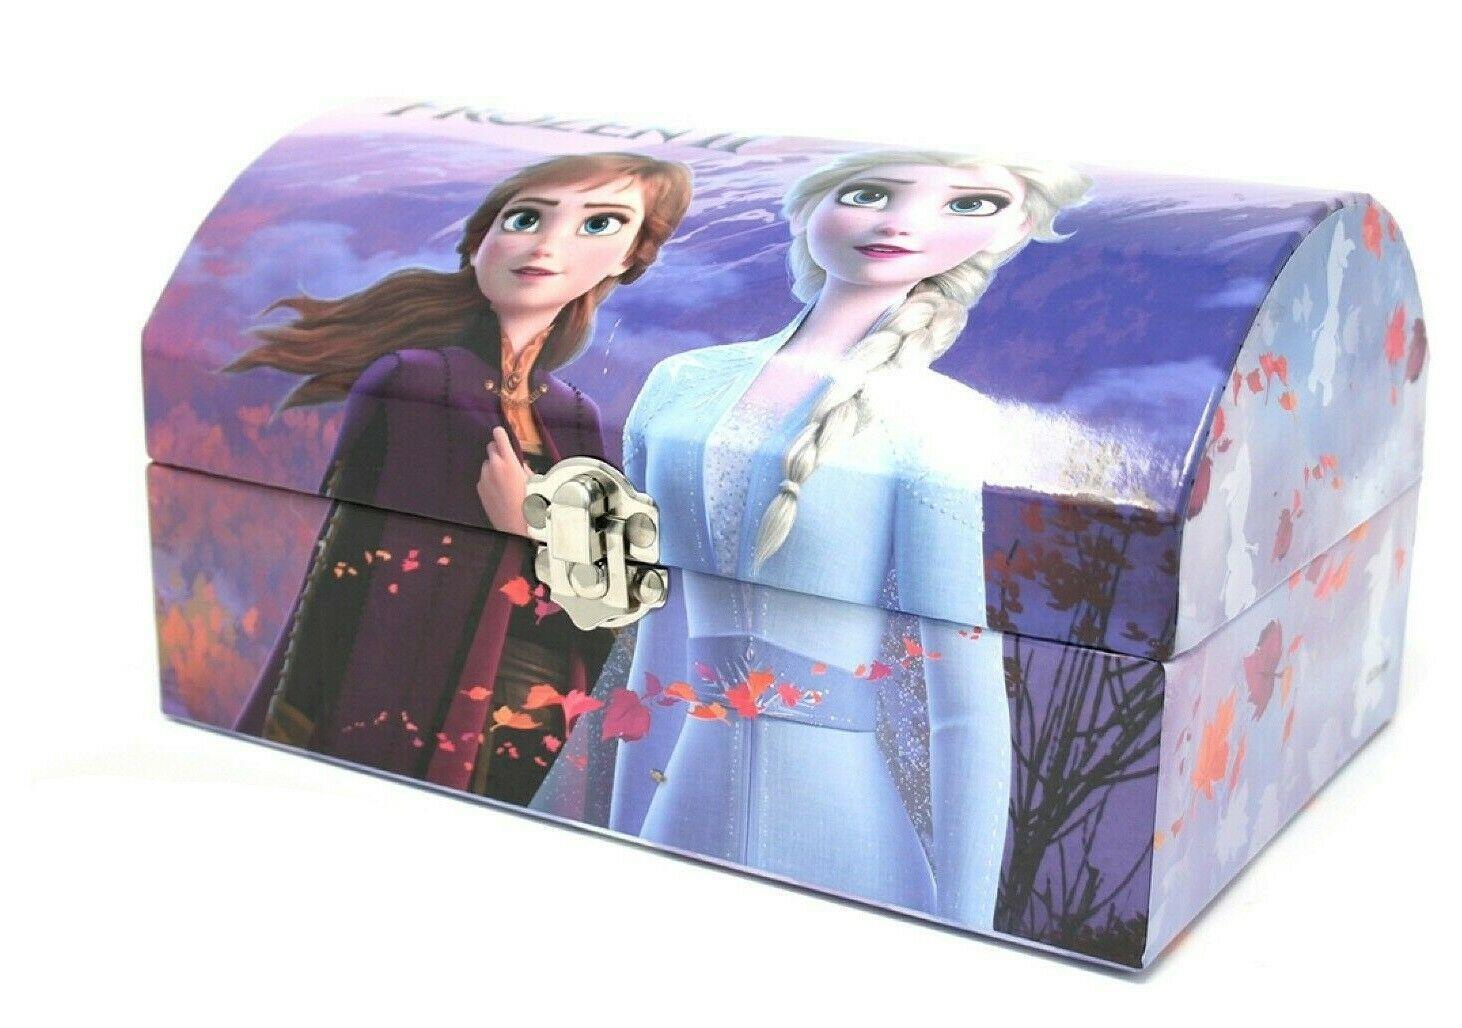 thumbnail 3 - Disney Frozen 2 Elsa Stationary Gift Set Case Chest Pencil Case Stocking Filler